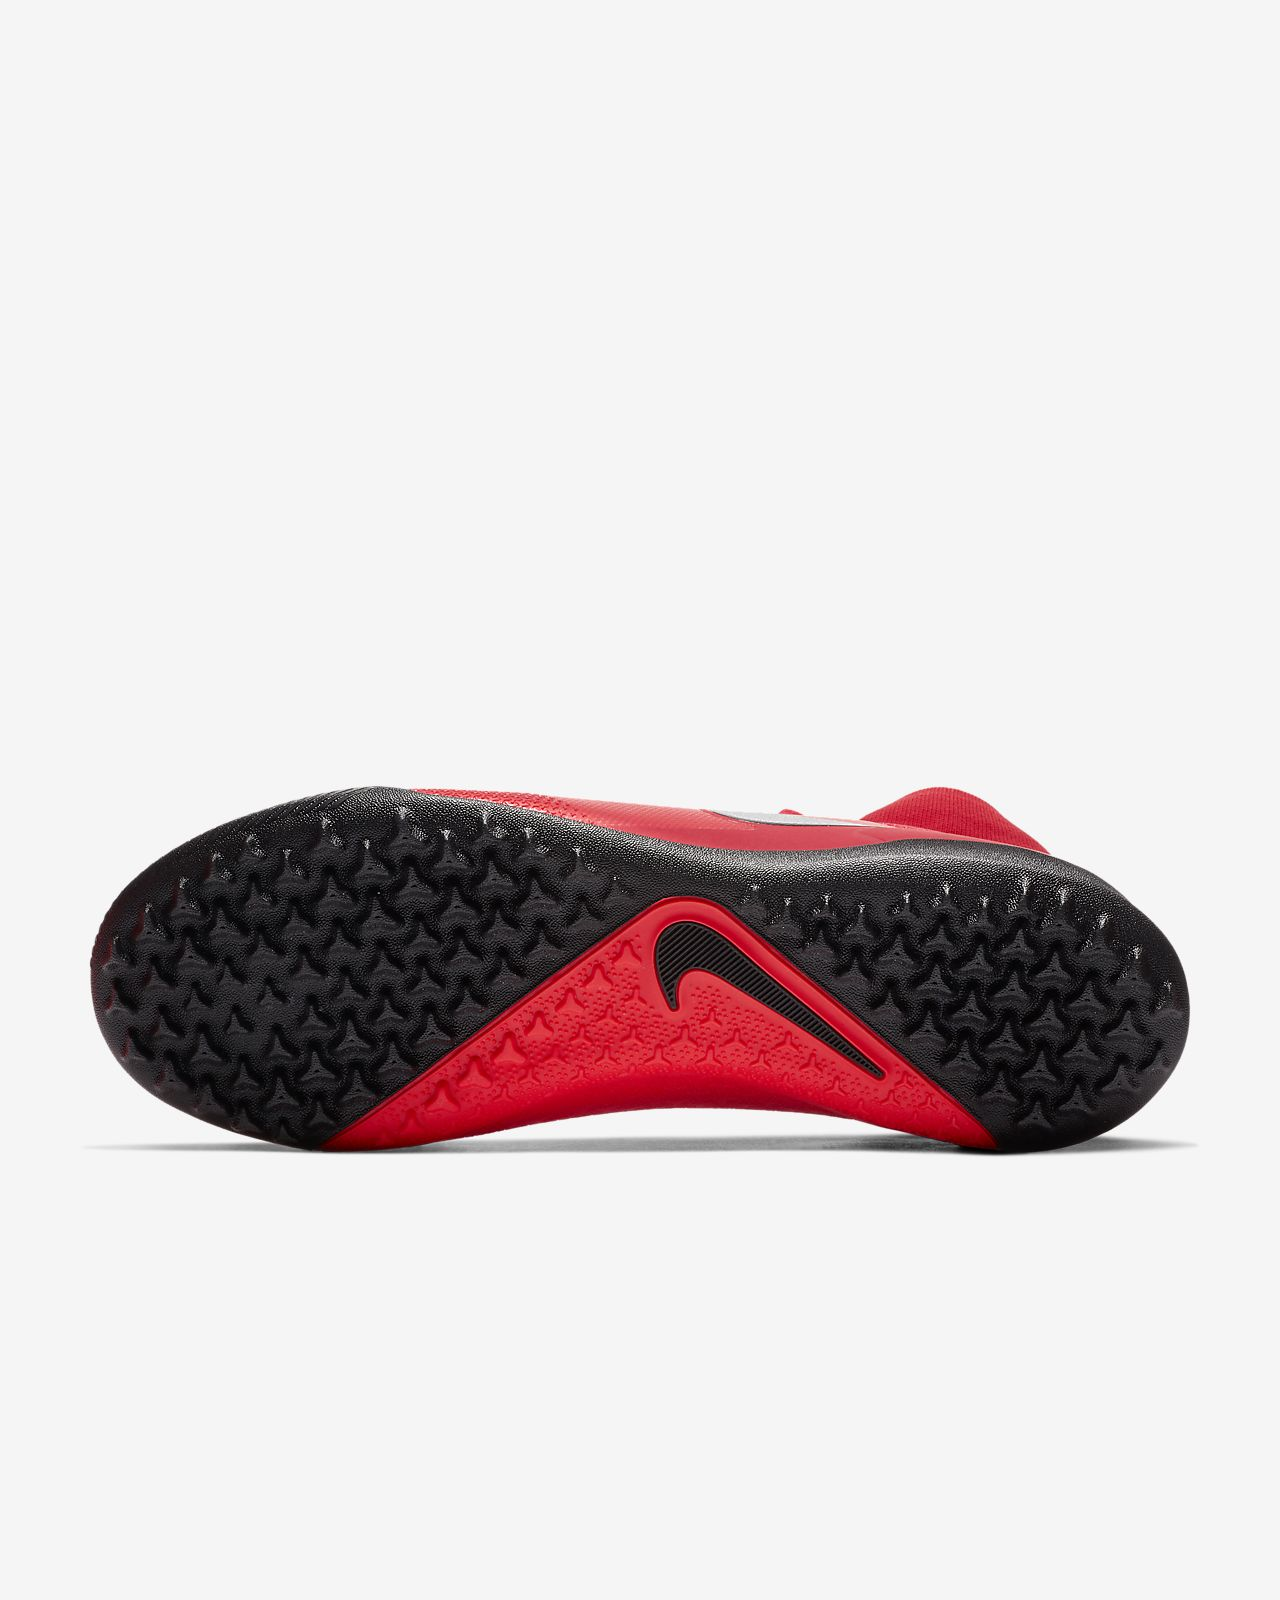 9f800ed2 ... Nike React PhantomVSN Pro Dynamic Fit Game Over TF Turf Football Shoe